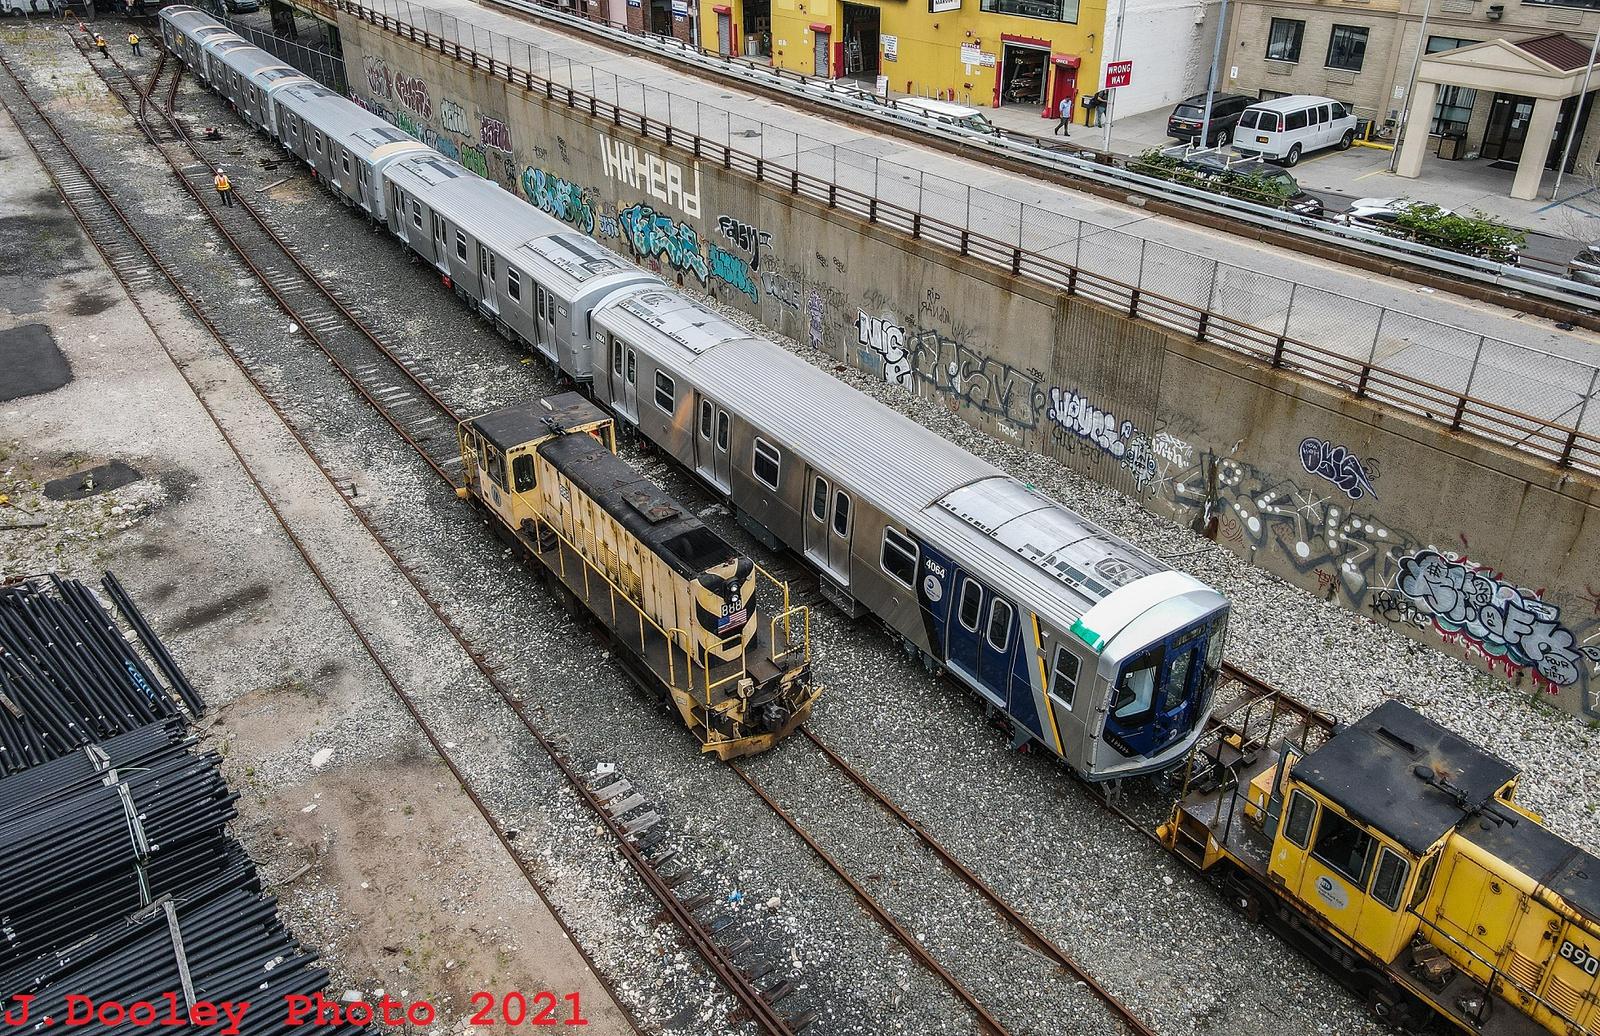 (1157k, 1600x1036)<br><b>Country:</b> United States<br><b>City:</b> New York<br><b>System:</b> New York City Transit<br><b>Car:</b> R-211 (Kawasaki, 2021-) 4064 <br><b>Photo by:</b> John Dooley<br><b>Date:</b> 7/1/2021<br><b>Notes:</b> R-211 delivery and press conference.<br><b>Viewed (this week/total):</b> 0 / 312